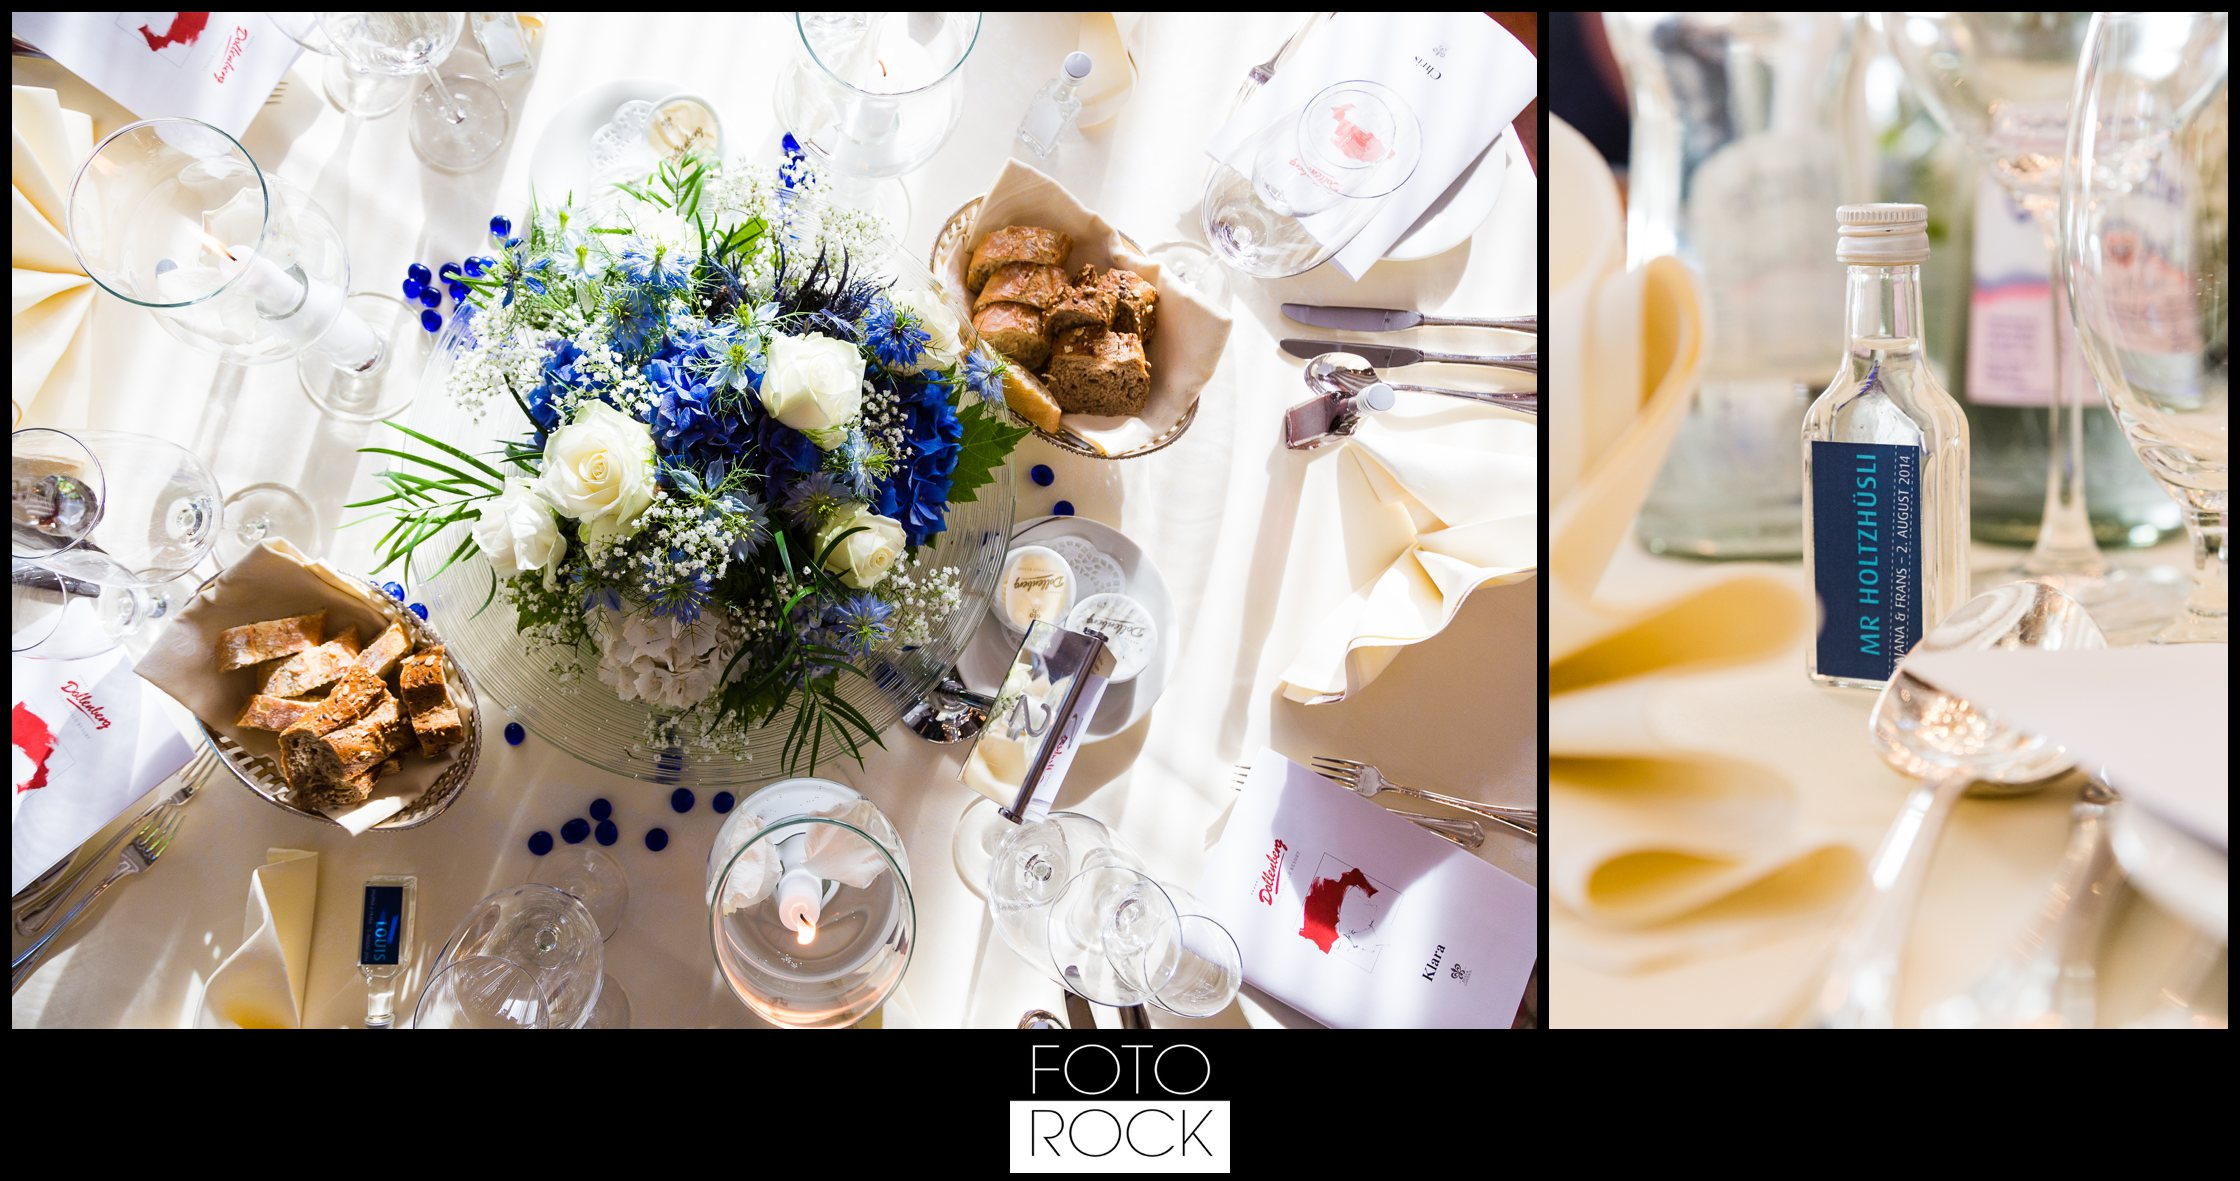 Hochzeit Dollenberg Bad Peterstal Deko Dekoration Tisc Blumen Kerzen Besteck